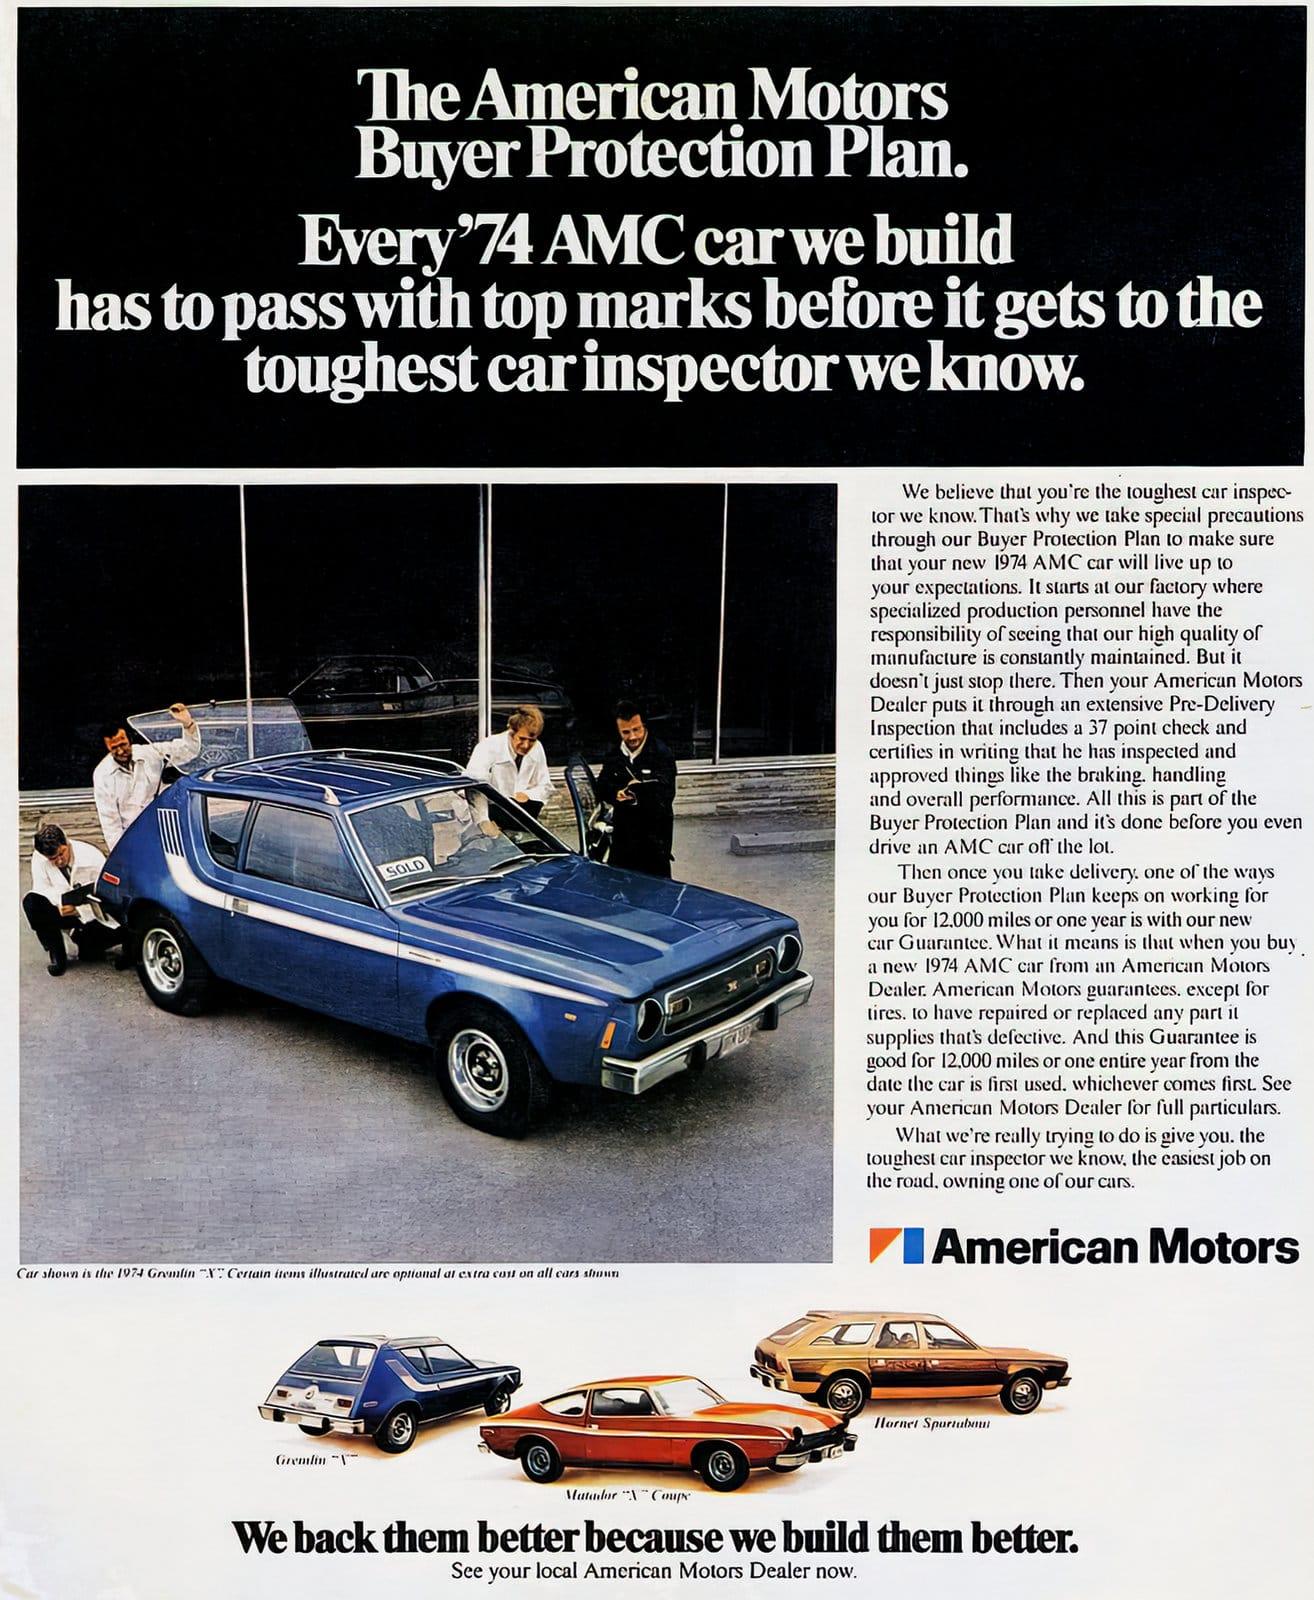 1974 AMC Gremlin - American Motors